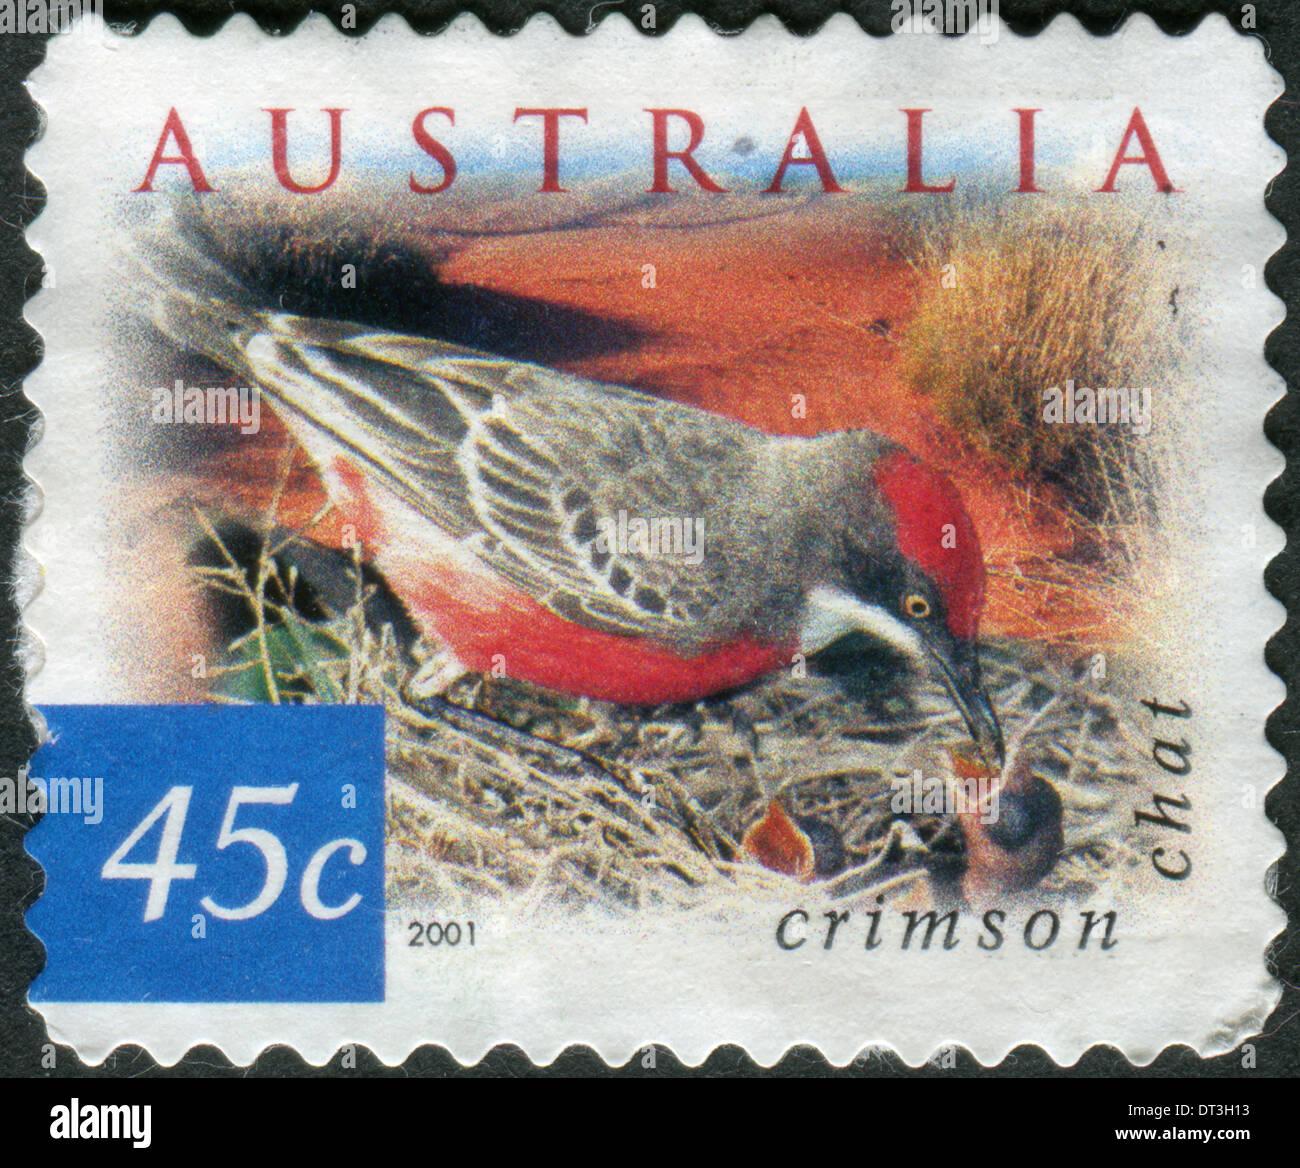 AUSTRALIA - CIRCA 2001: Postage stamp printed in Australia, shows bird Crimson Chat (Epthianura tricolor), circa 2001 - Stock Image